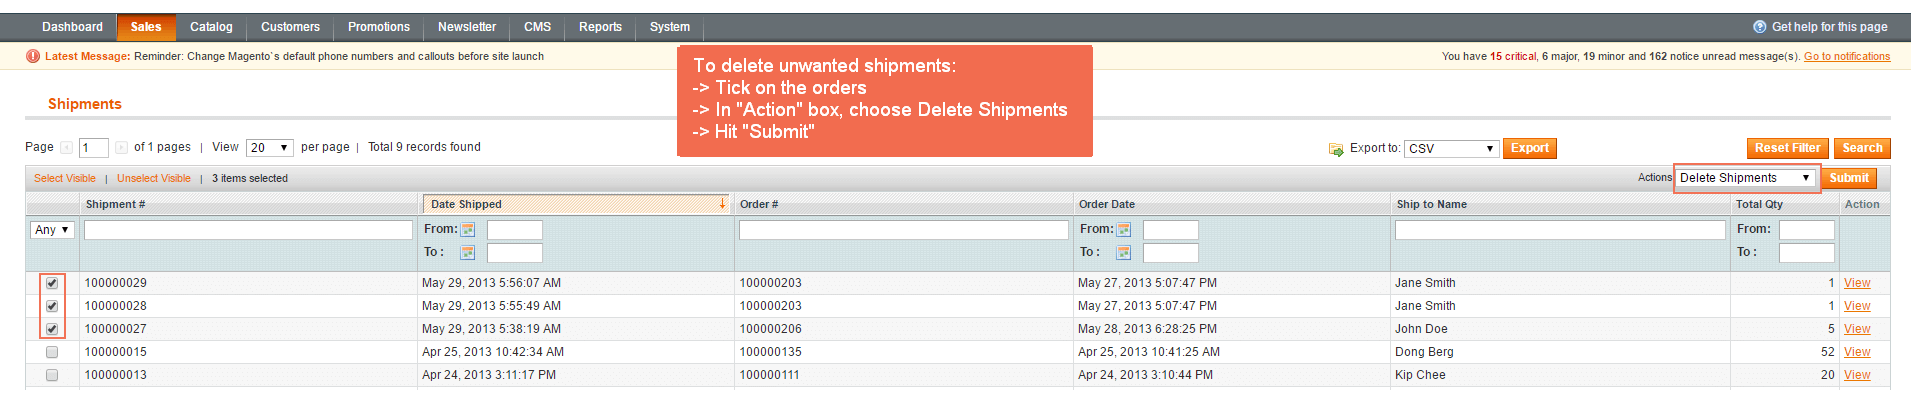 magento-delete-orders-delete-shipments